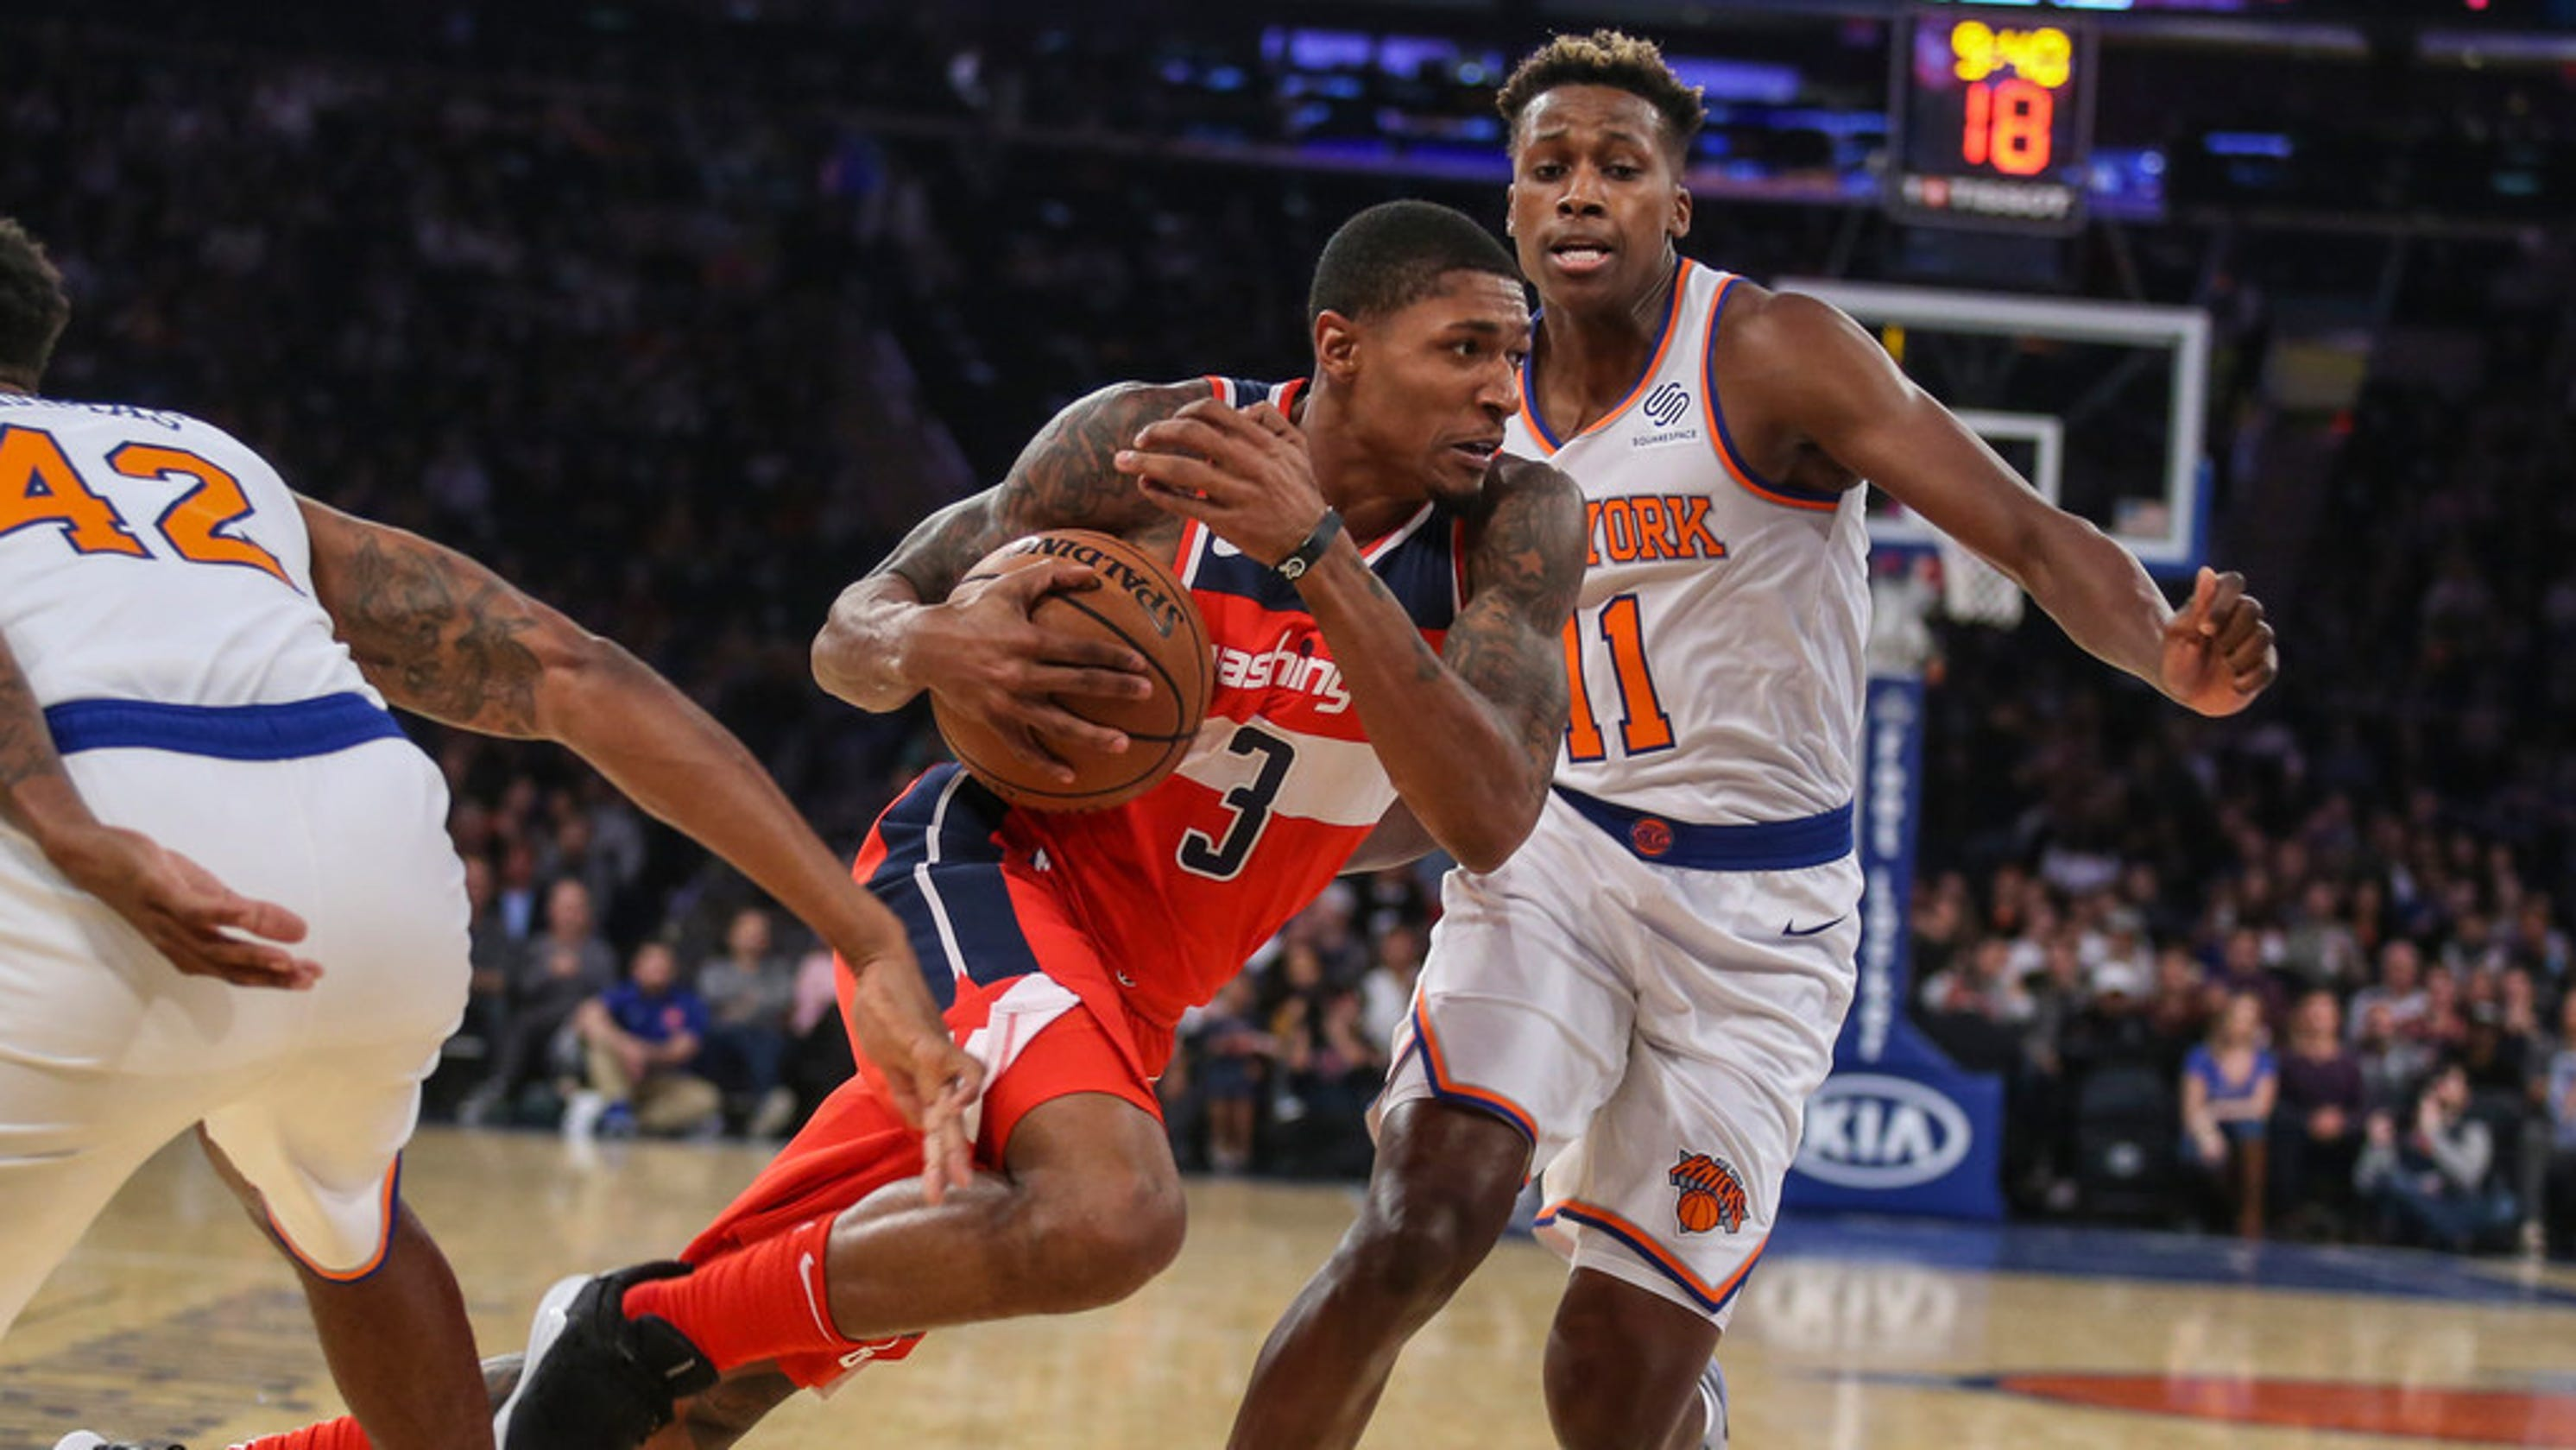 New York Knicks: New York Knicks: How Frank Ntilikina Fared In Preseason Start